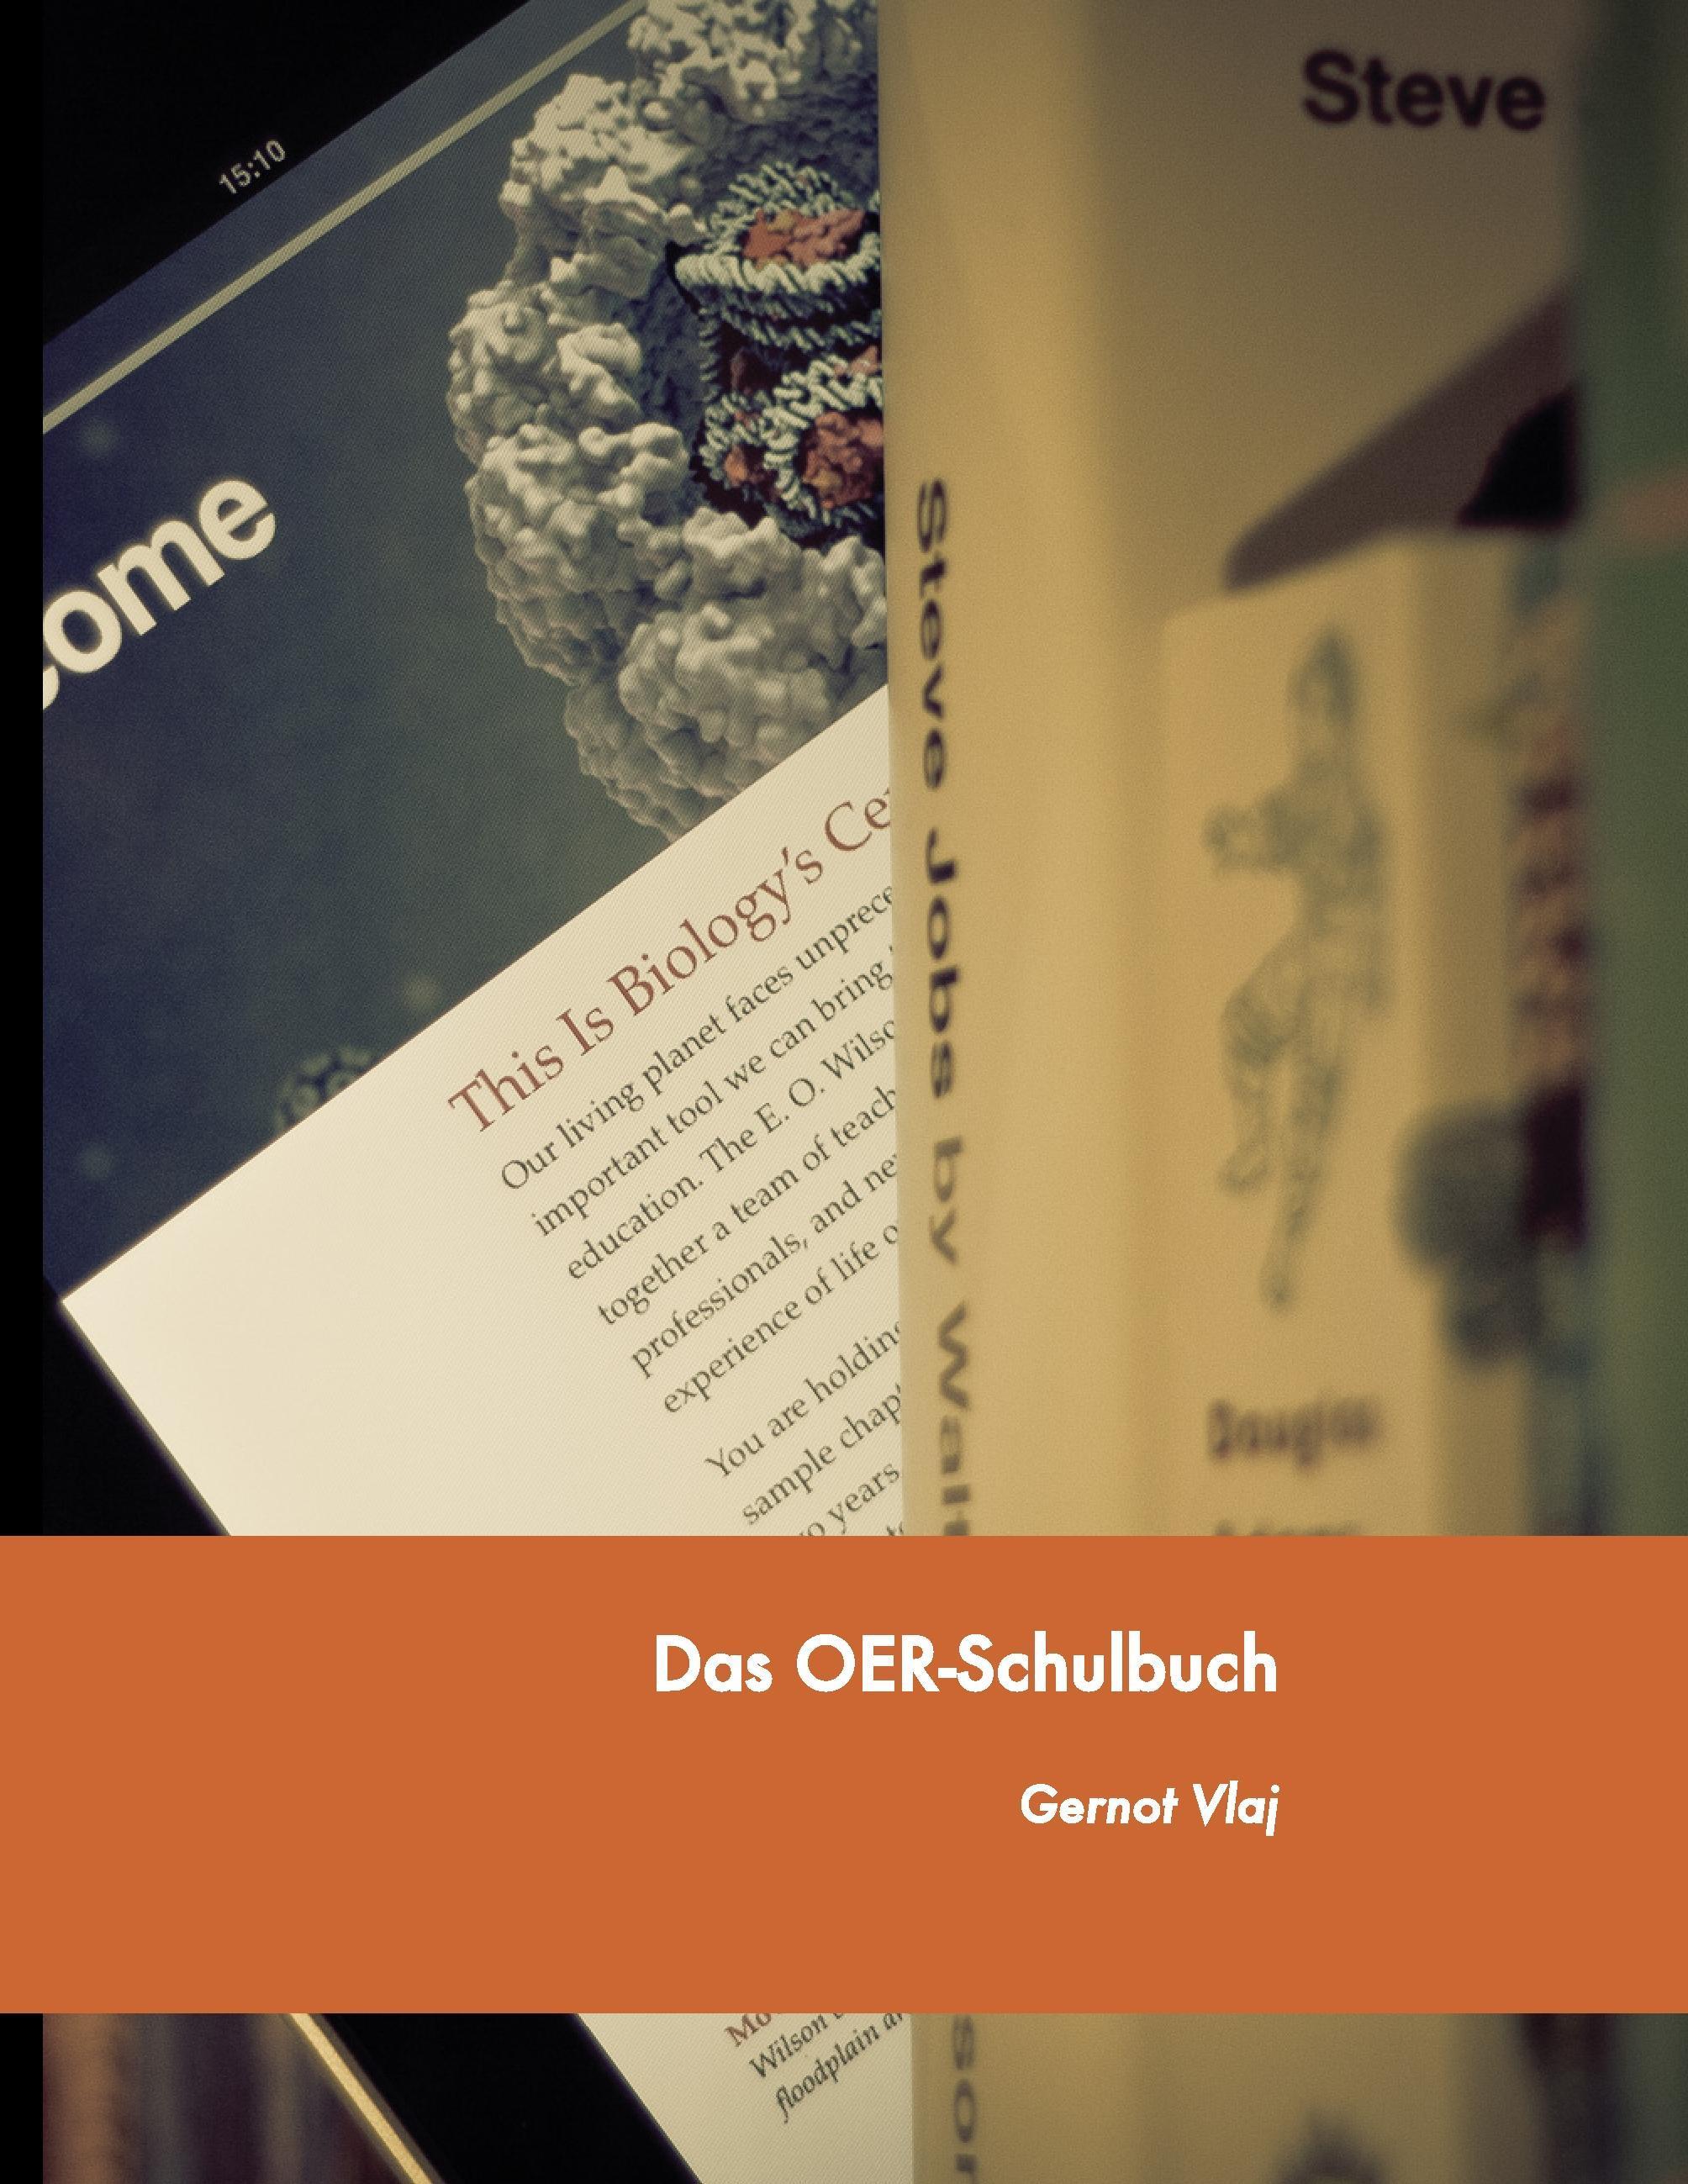 Das OER-Schulbuch